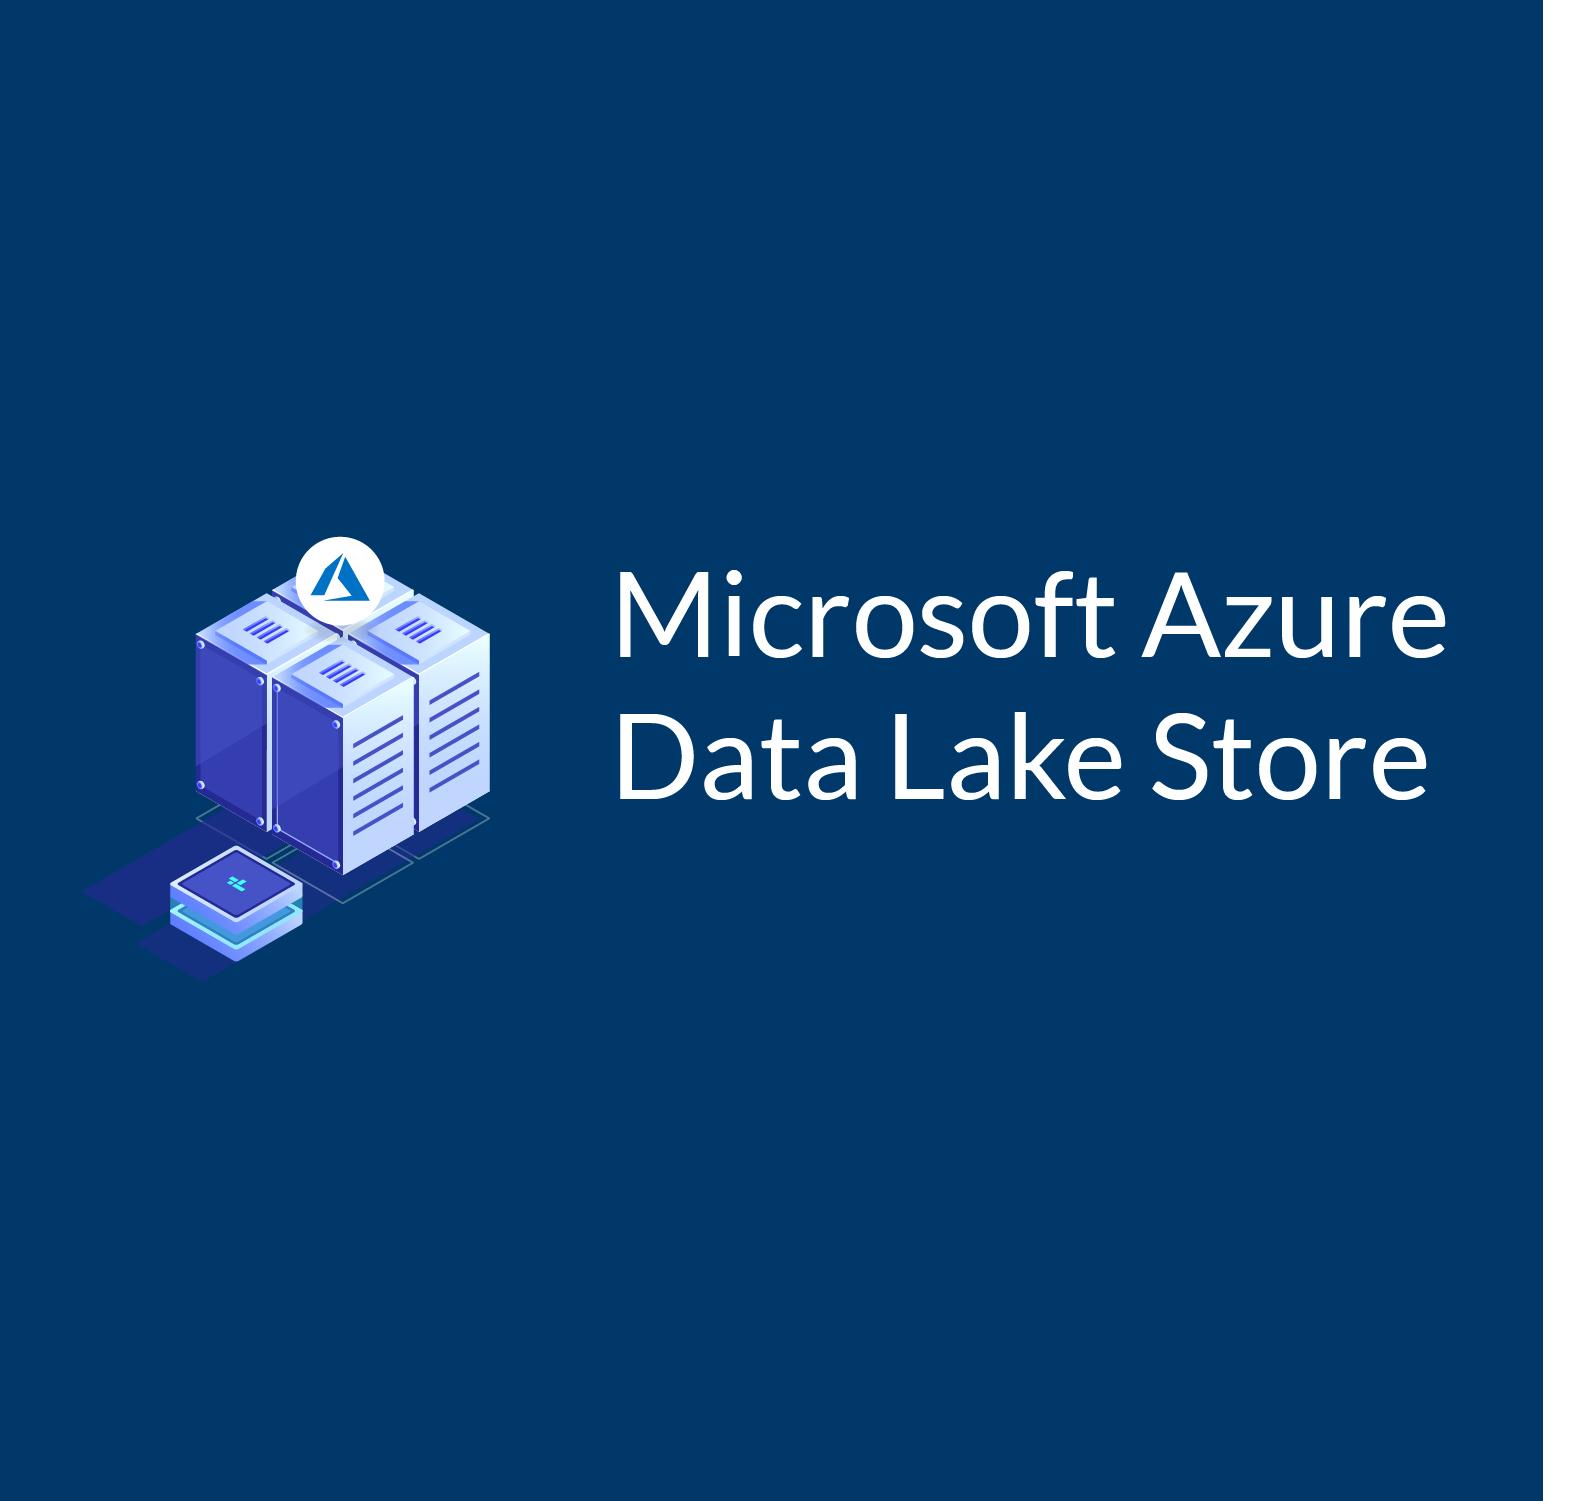 Microsoft Azure Data Lake Store - An Introduction